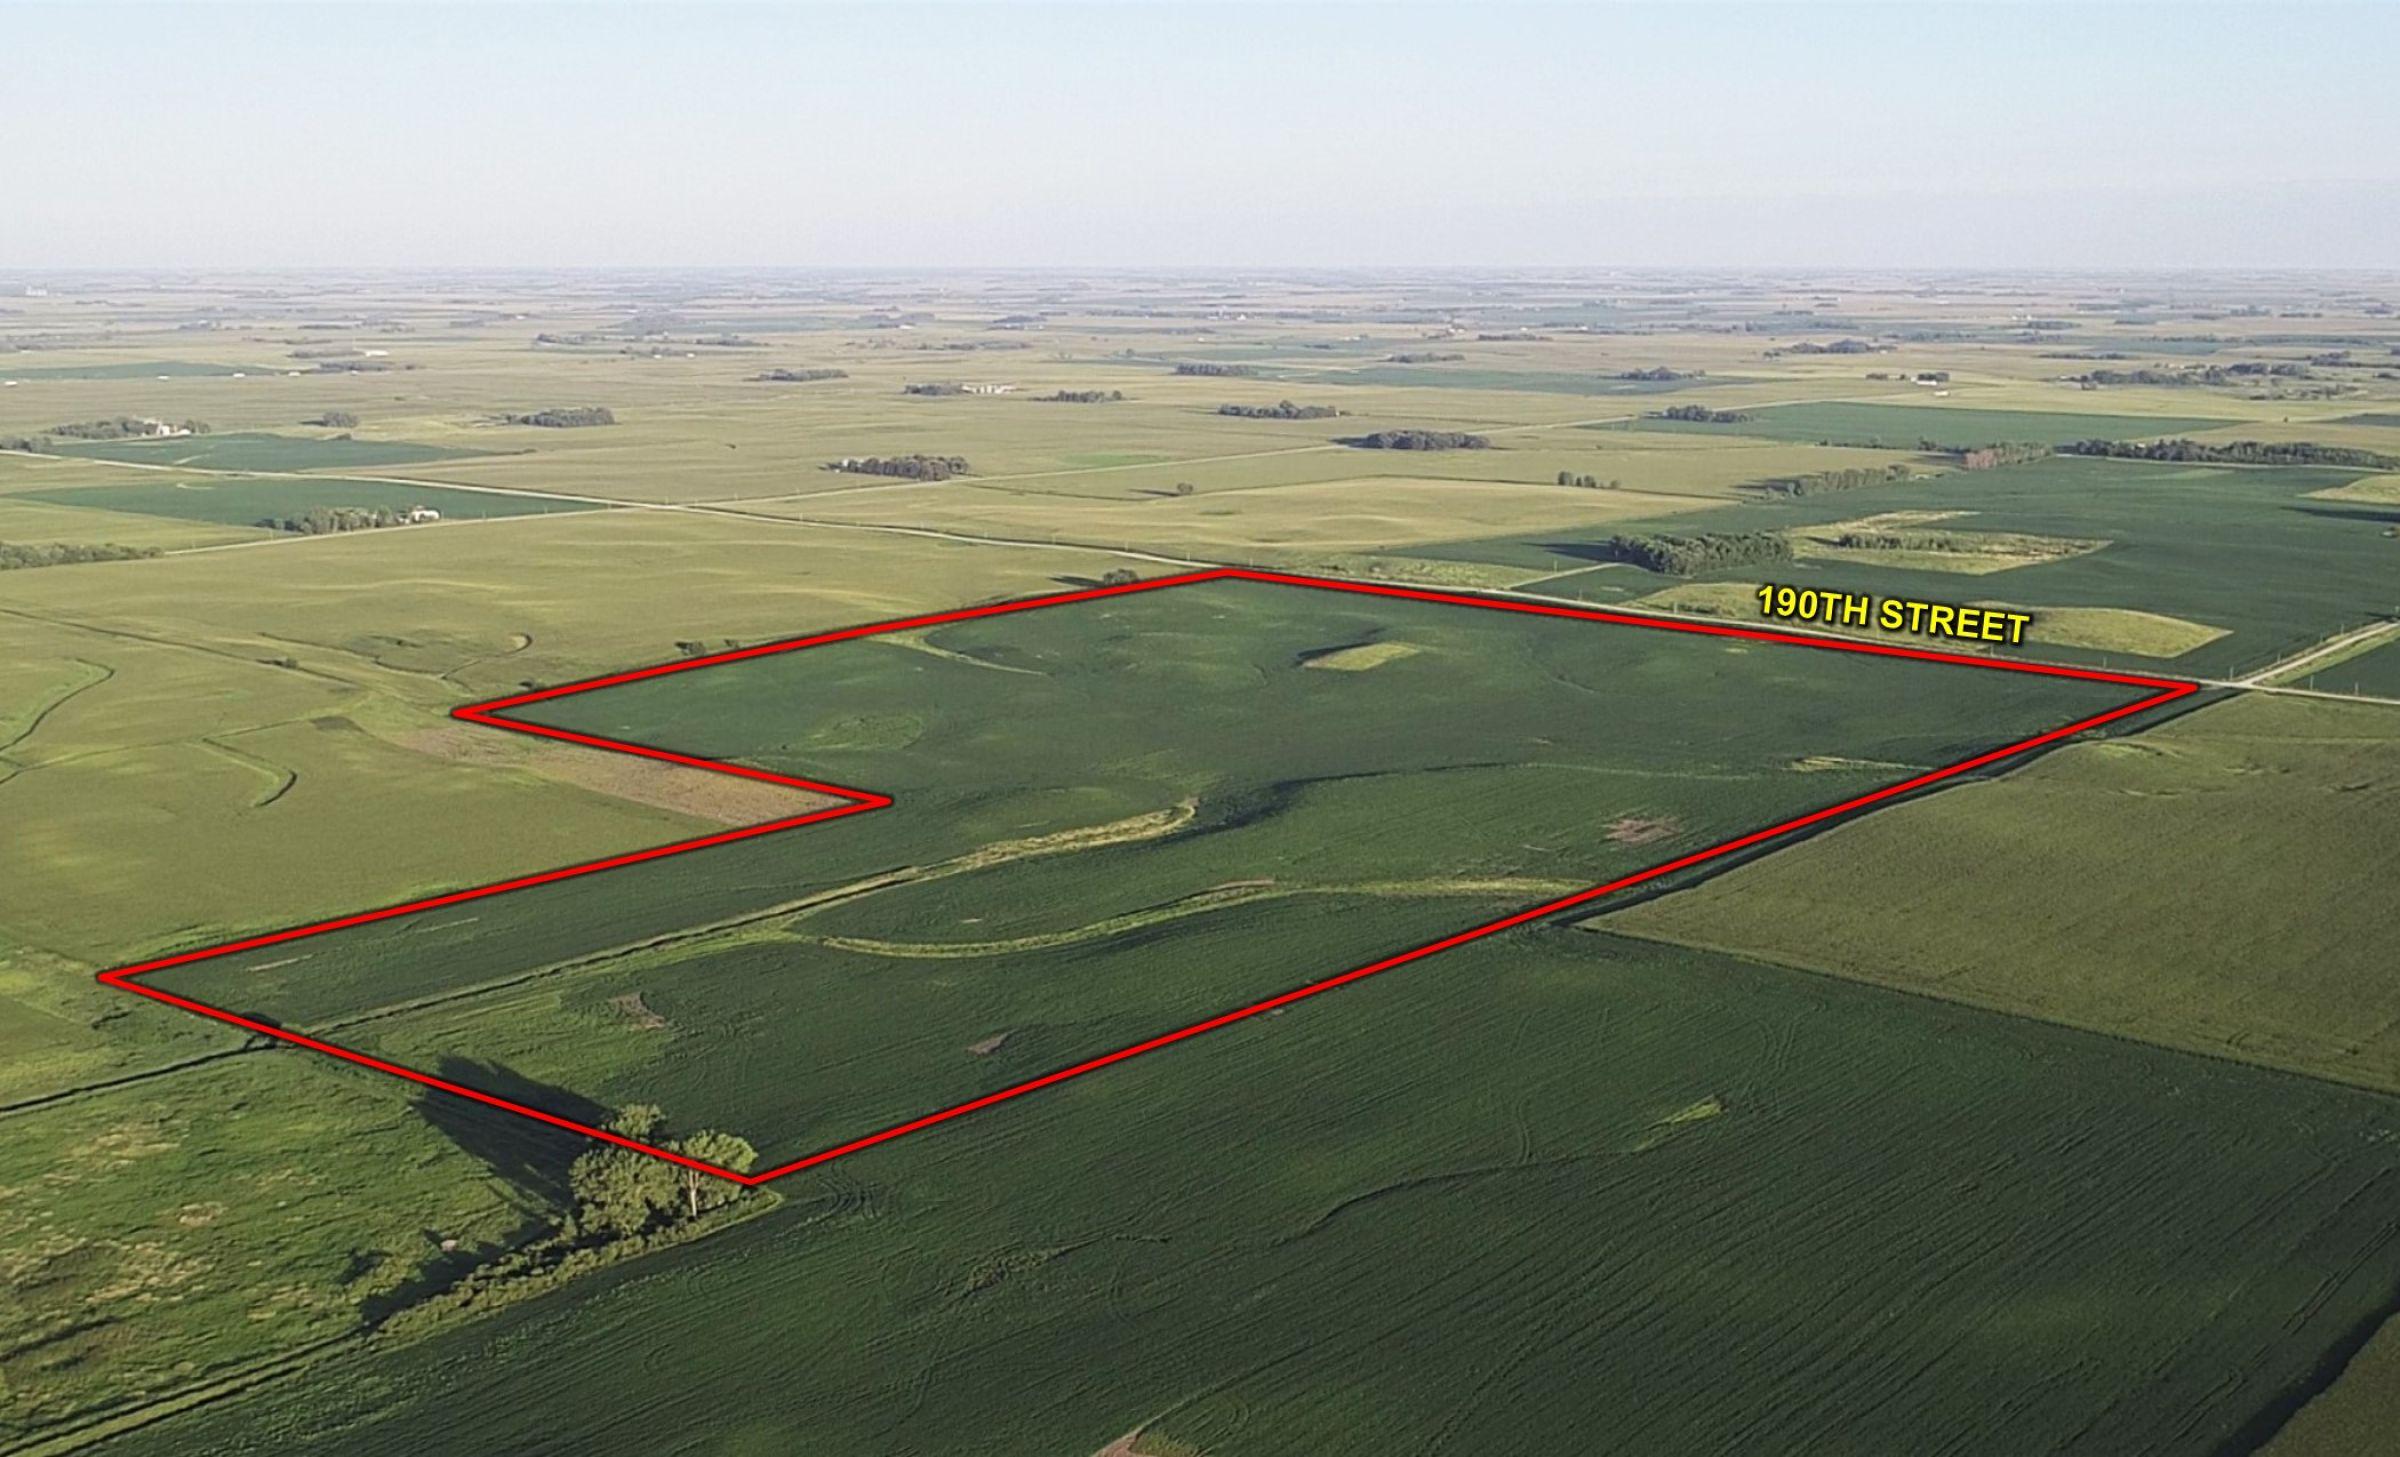 14763-cerro-gordo-farmland-for-sale-200-acres-ml-2-2019-11-07-180007.jpg